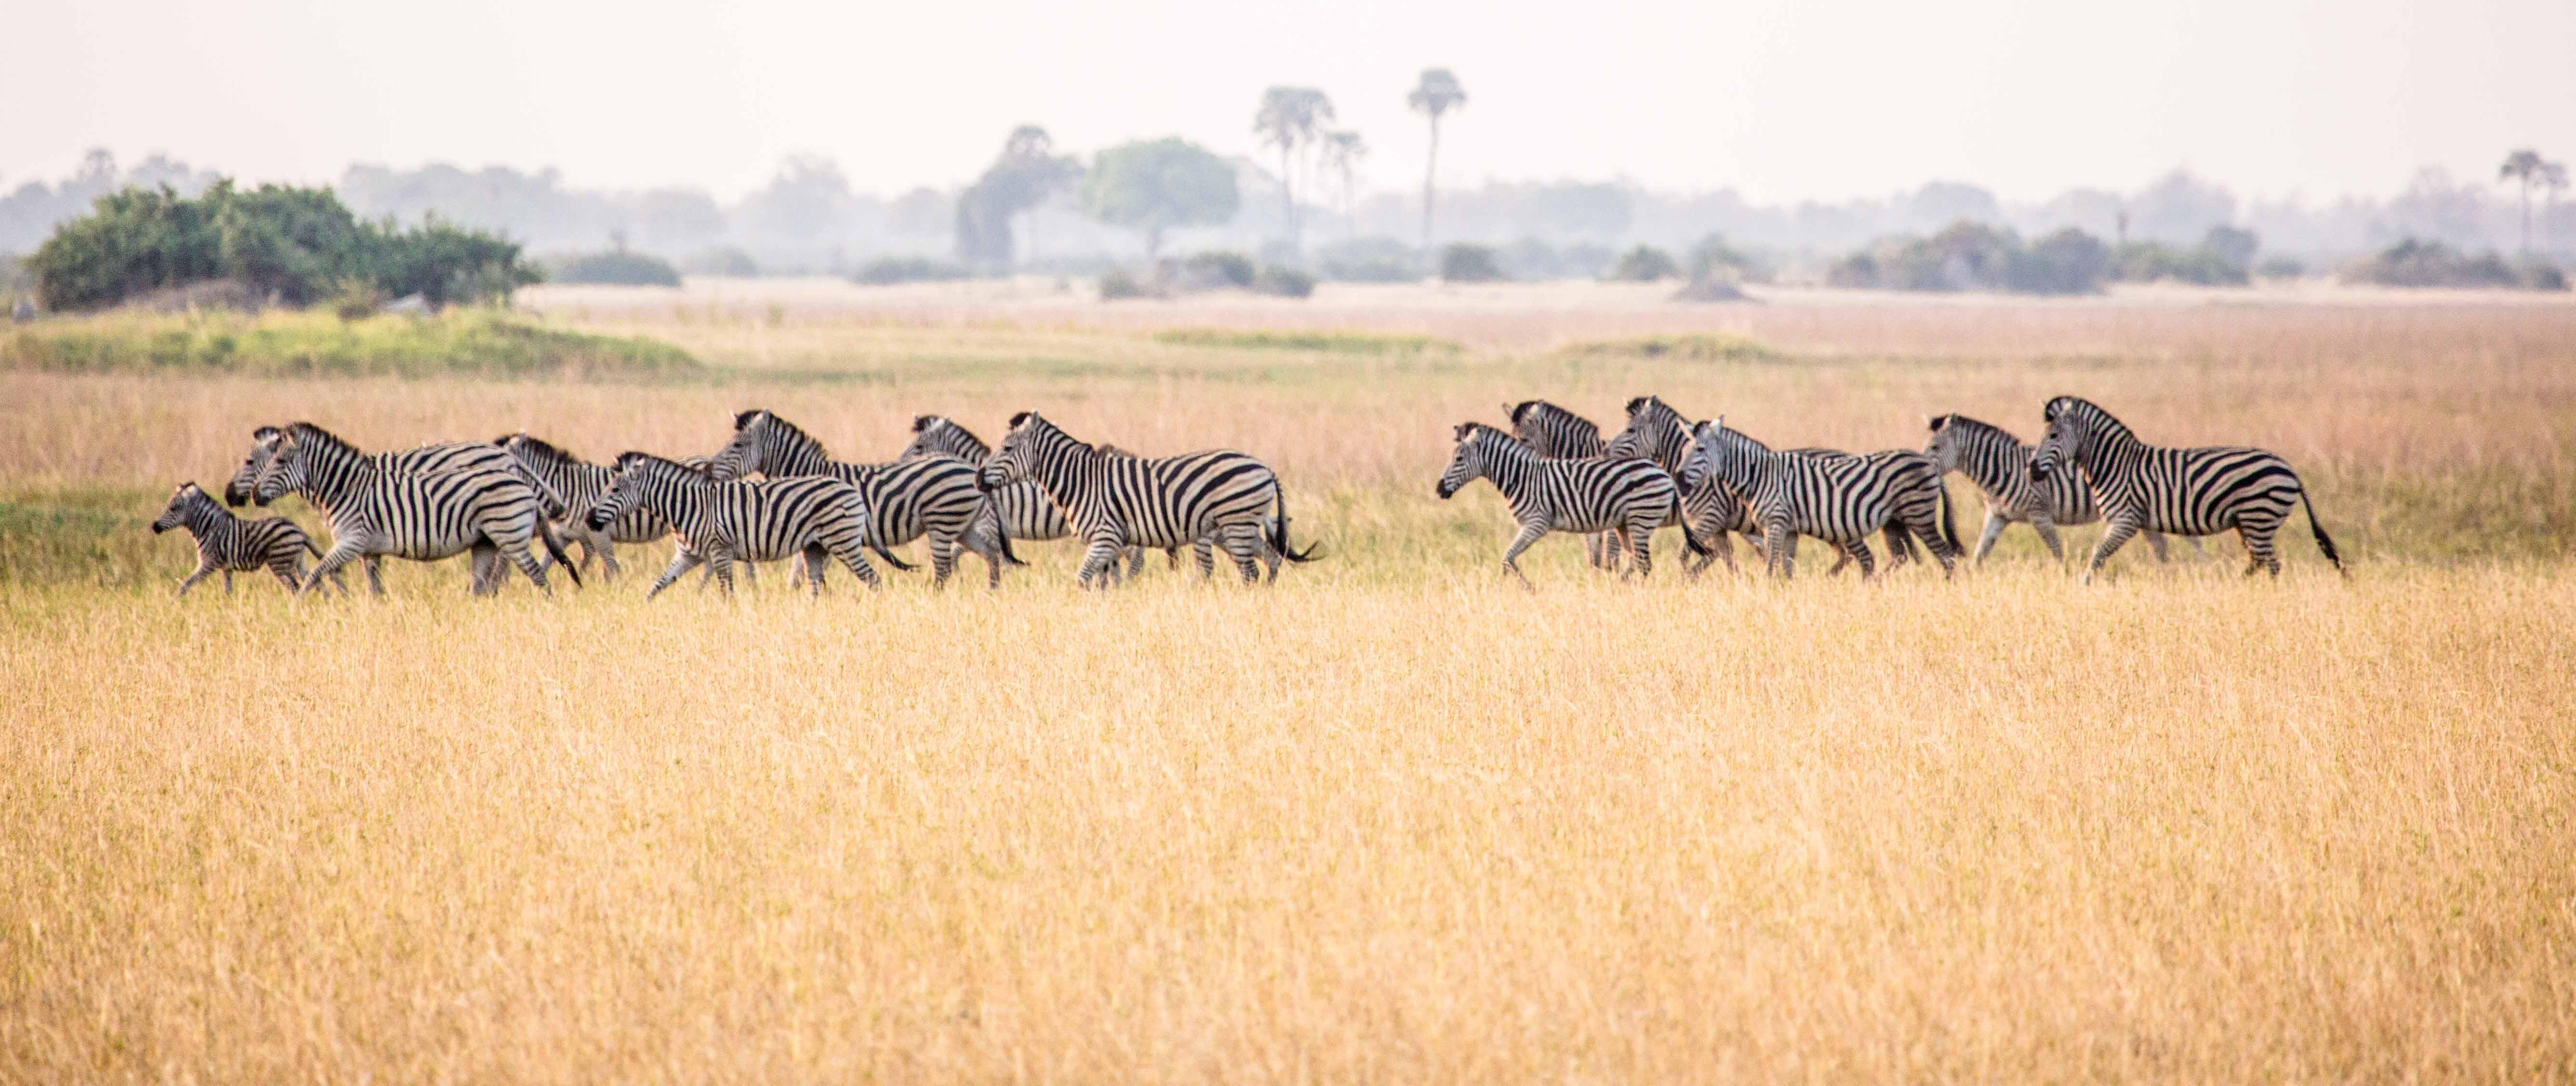 botswana zebras in grasslands